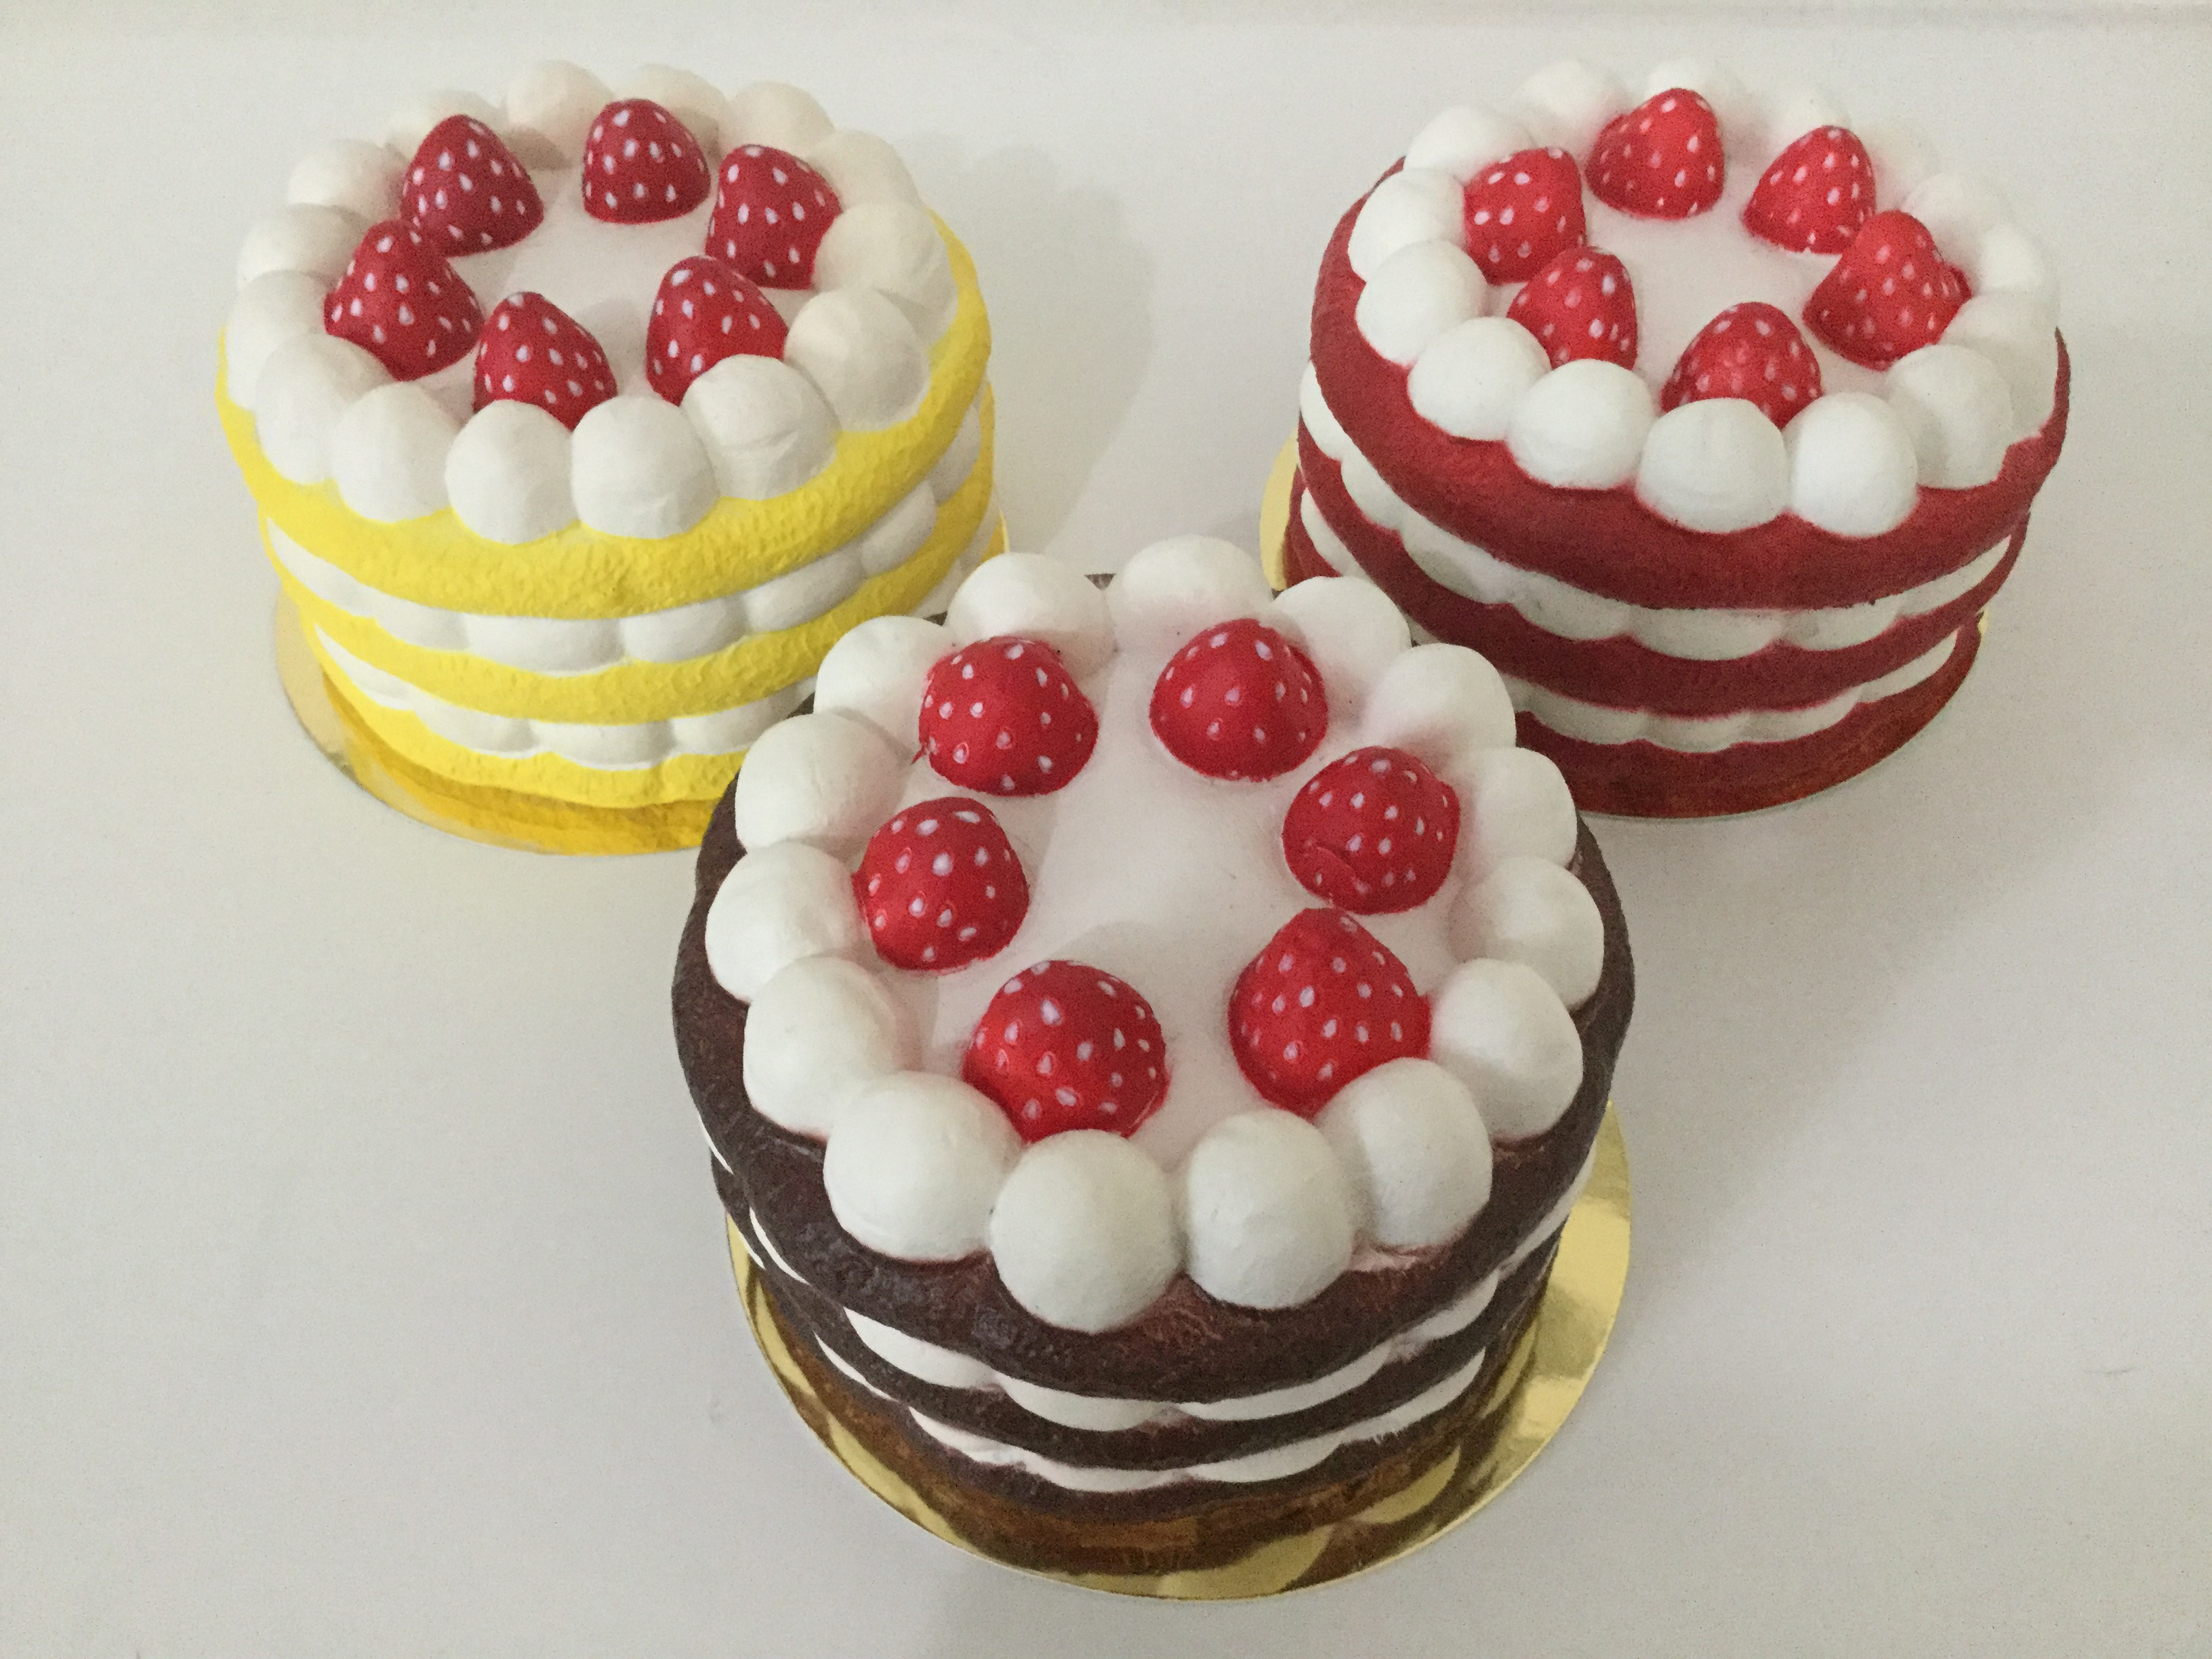 Next Eric Marshmallow Cake